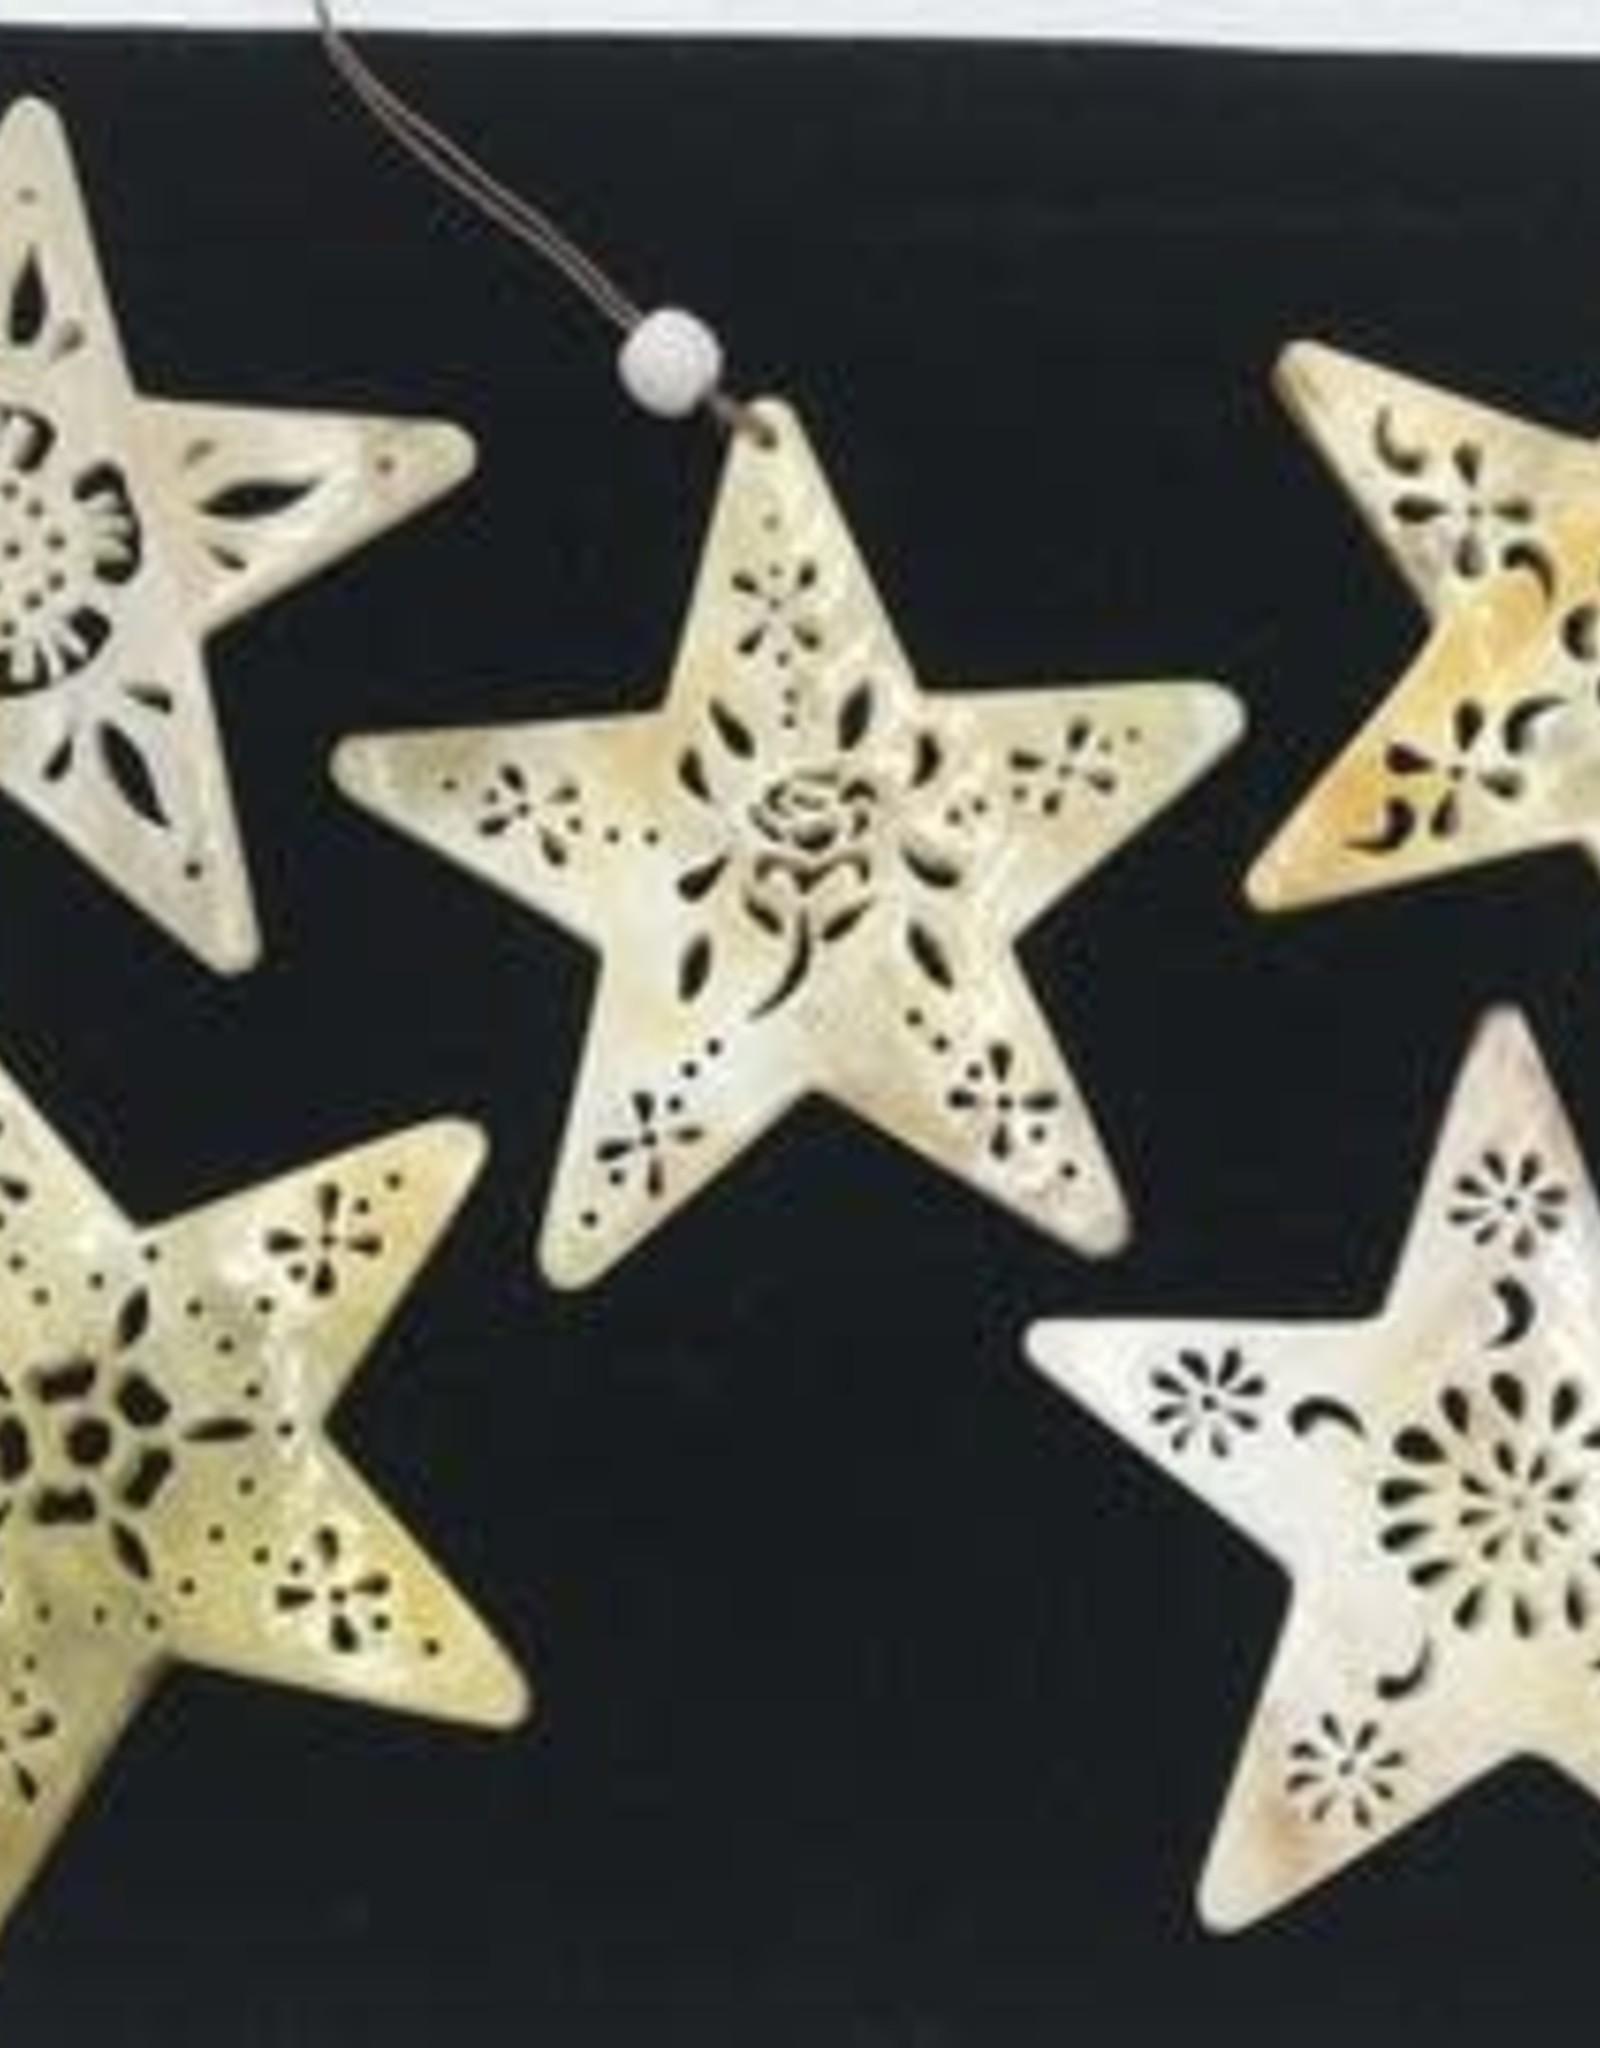 Peru, Horn Ornaments Star